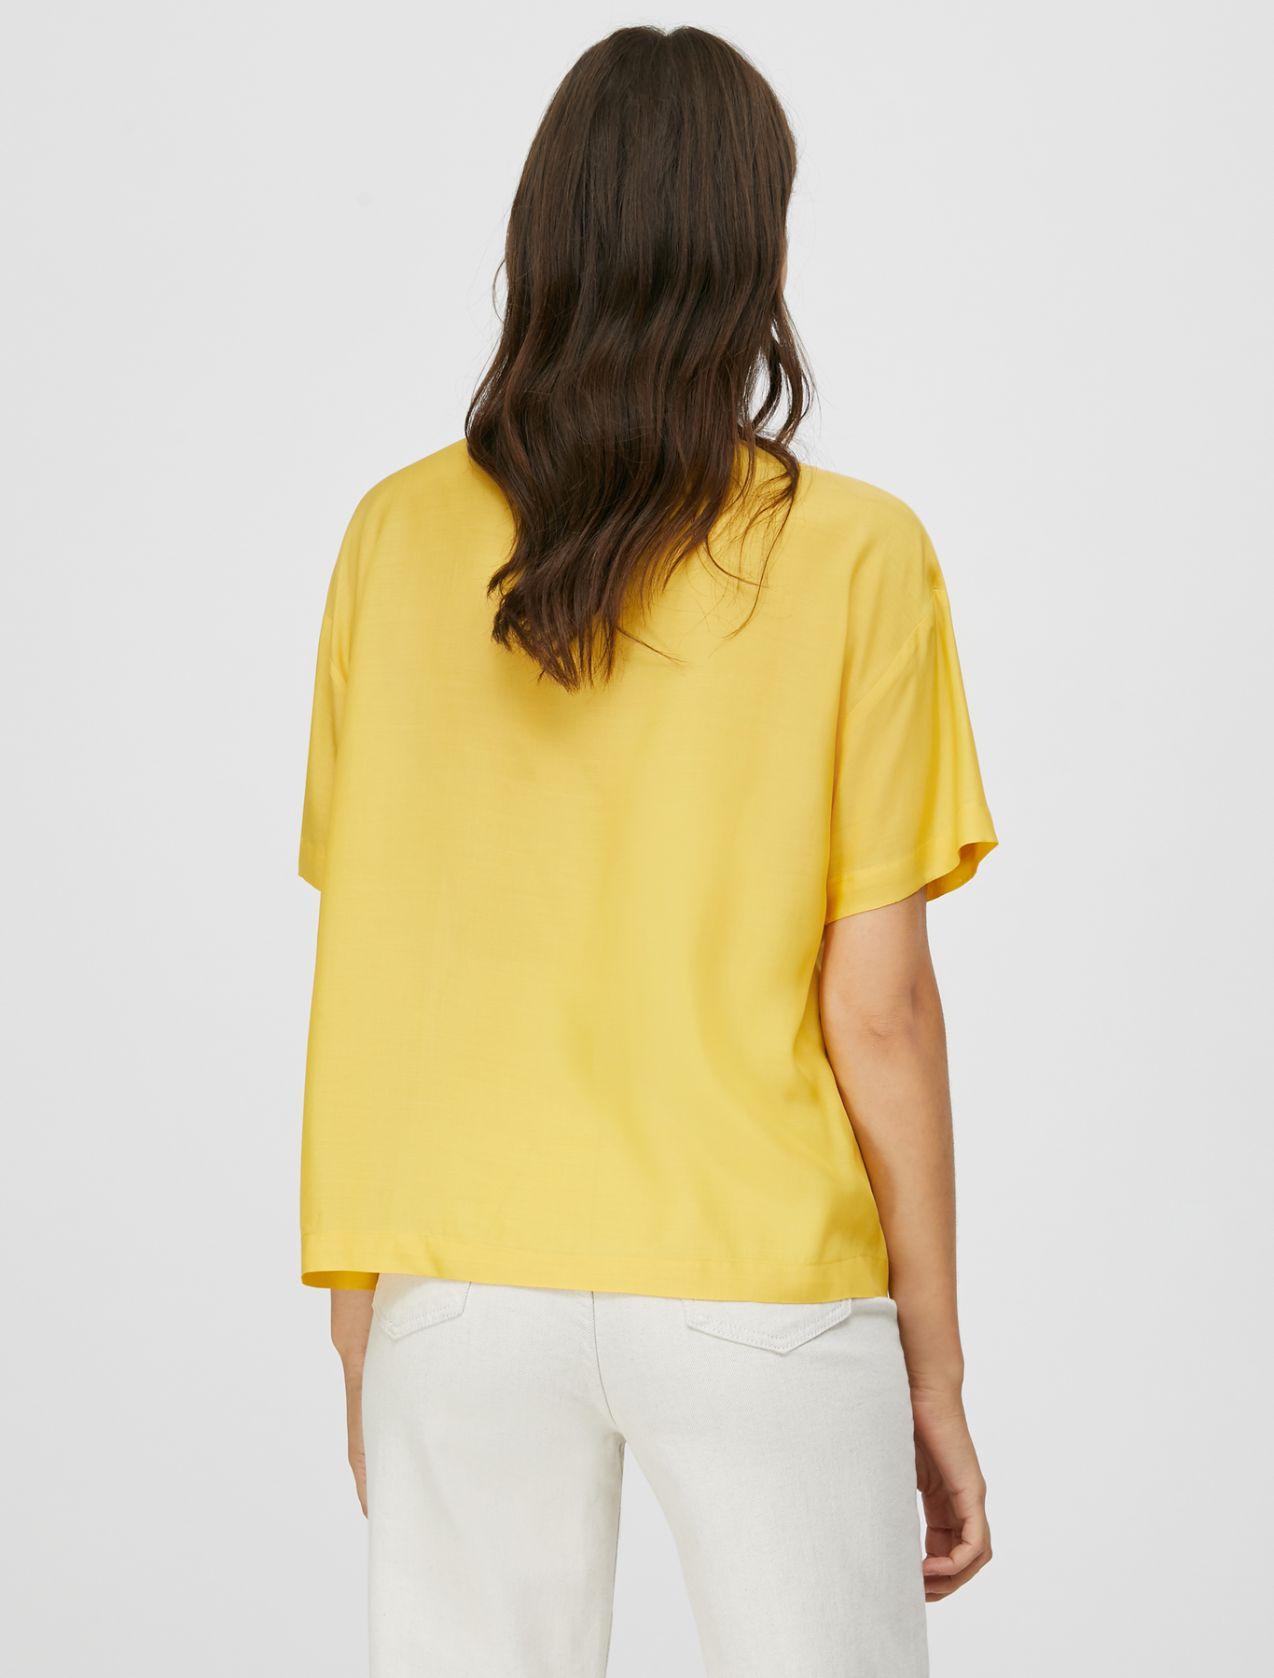 DISPENSA Shirt sunshine yellow 2